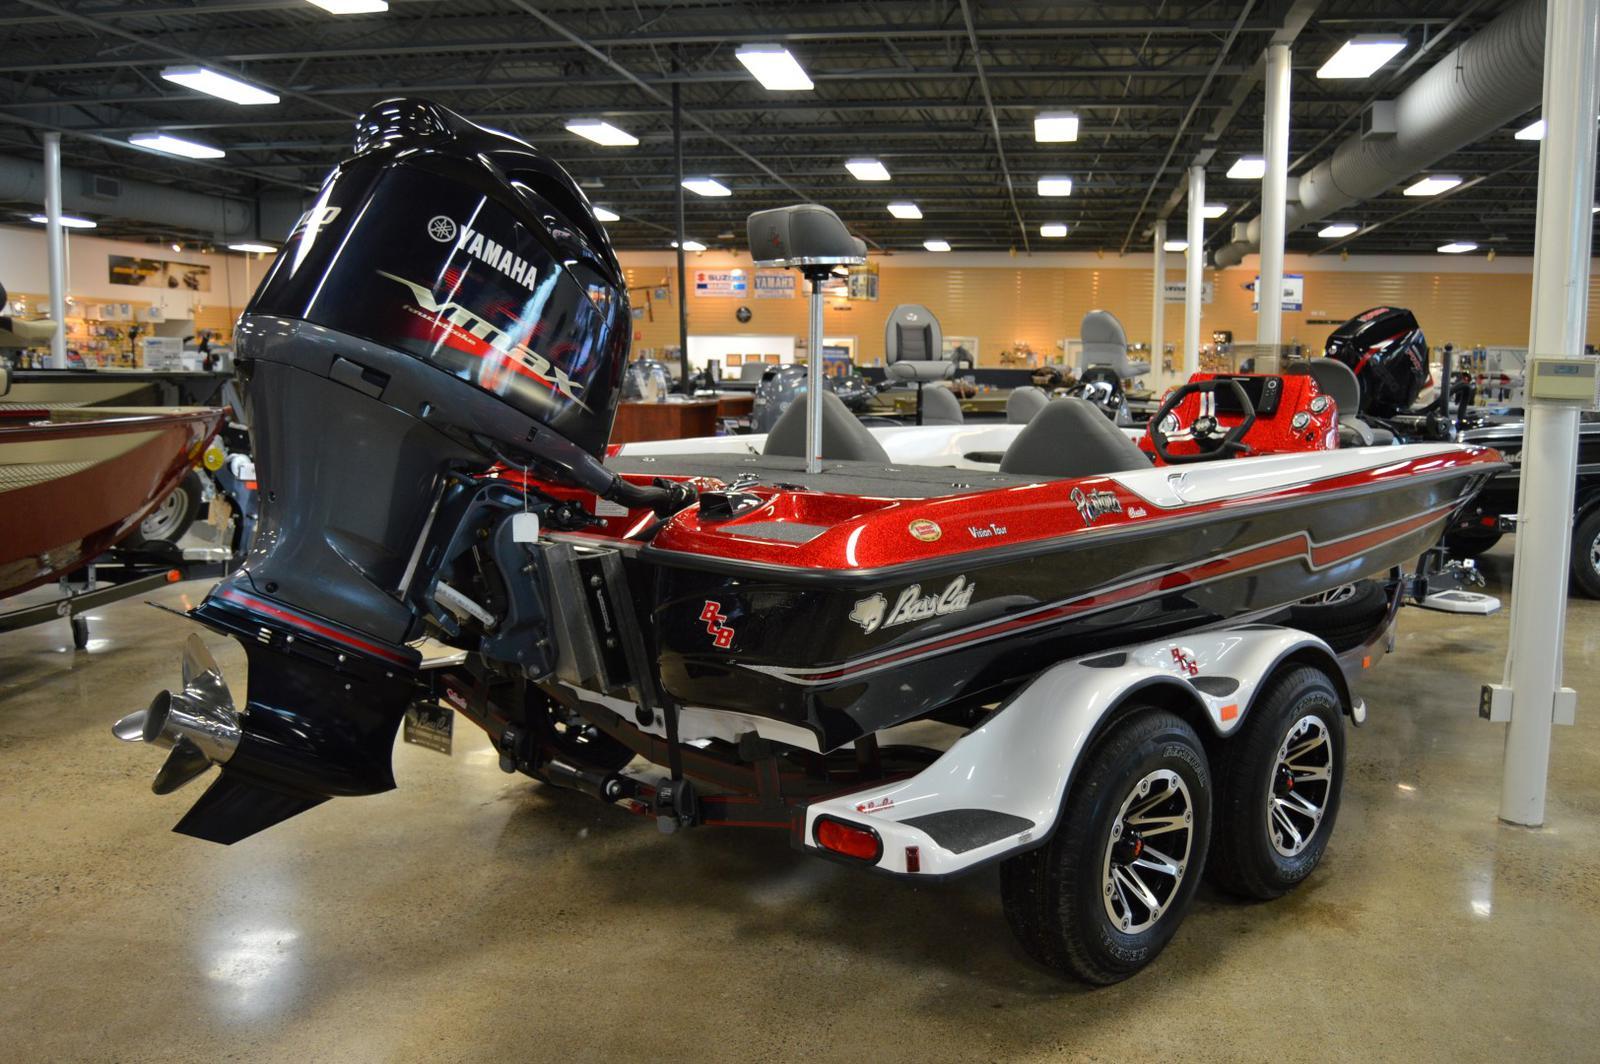 2019 bass cat boats pantera classic for sale in minneapolis, mn2019 basscat pantera classic 4